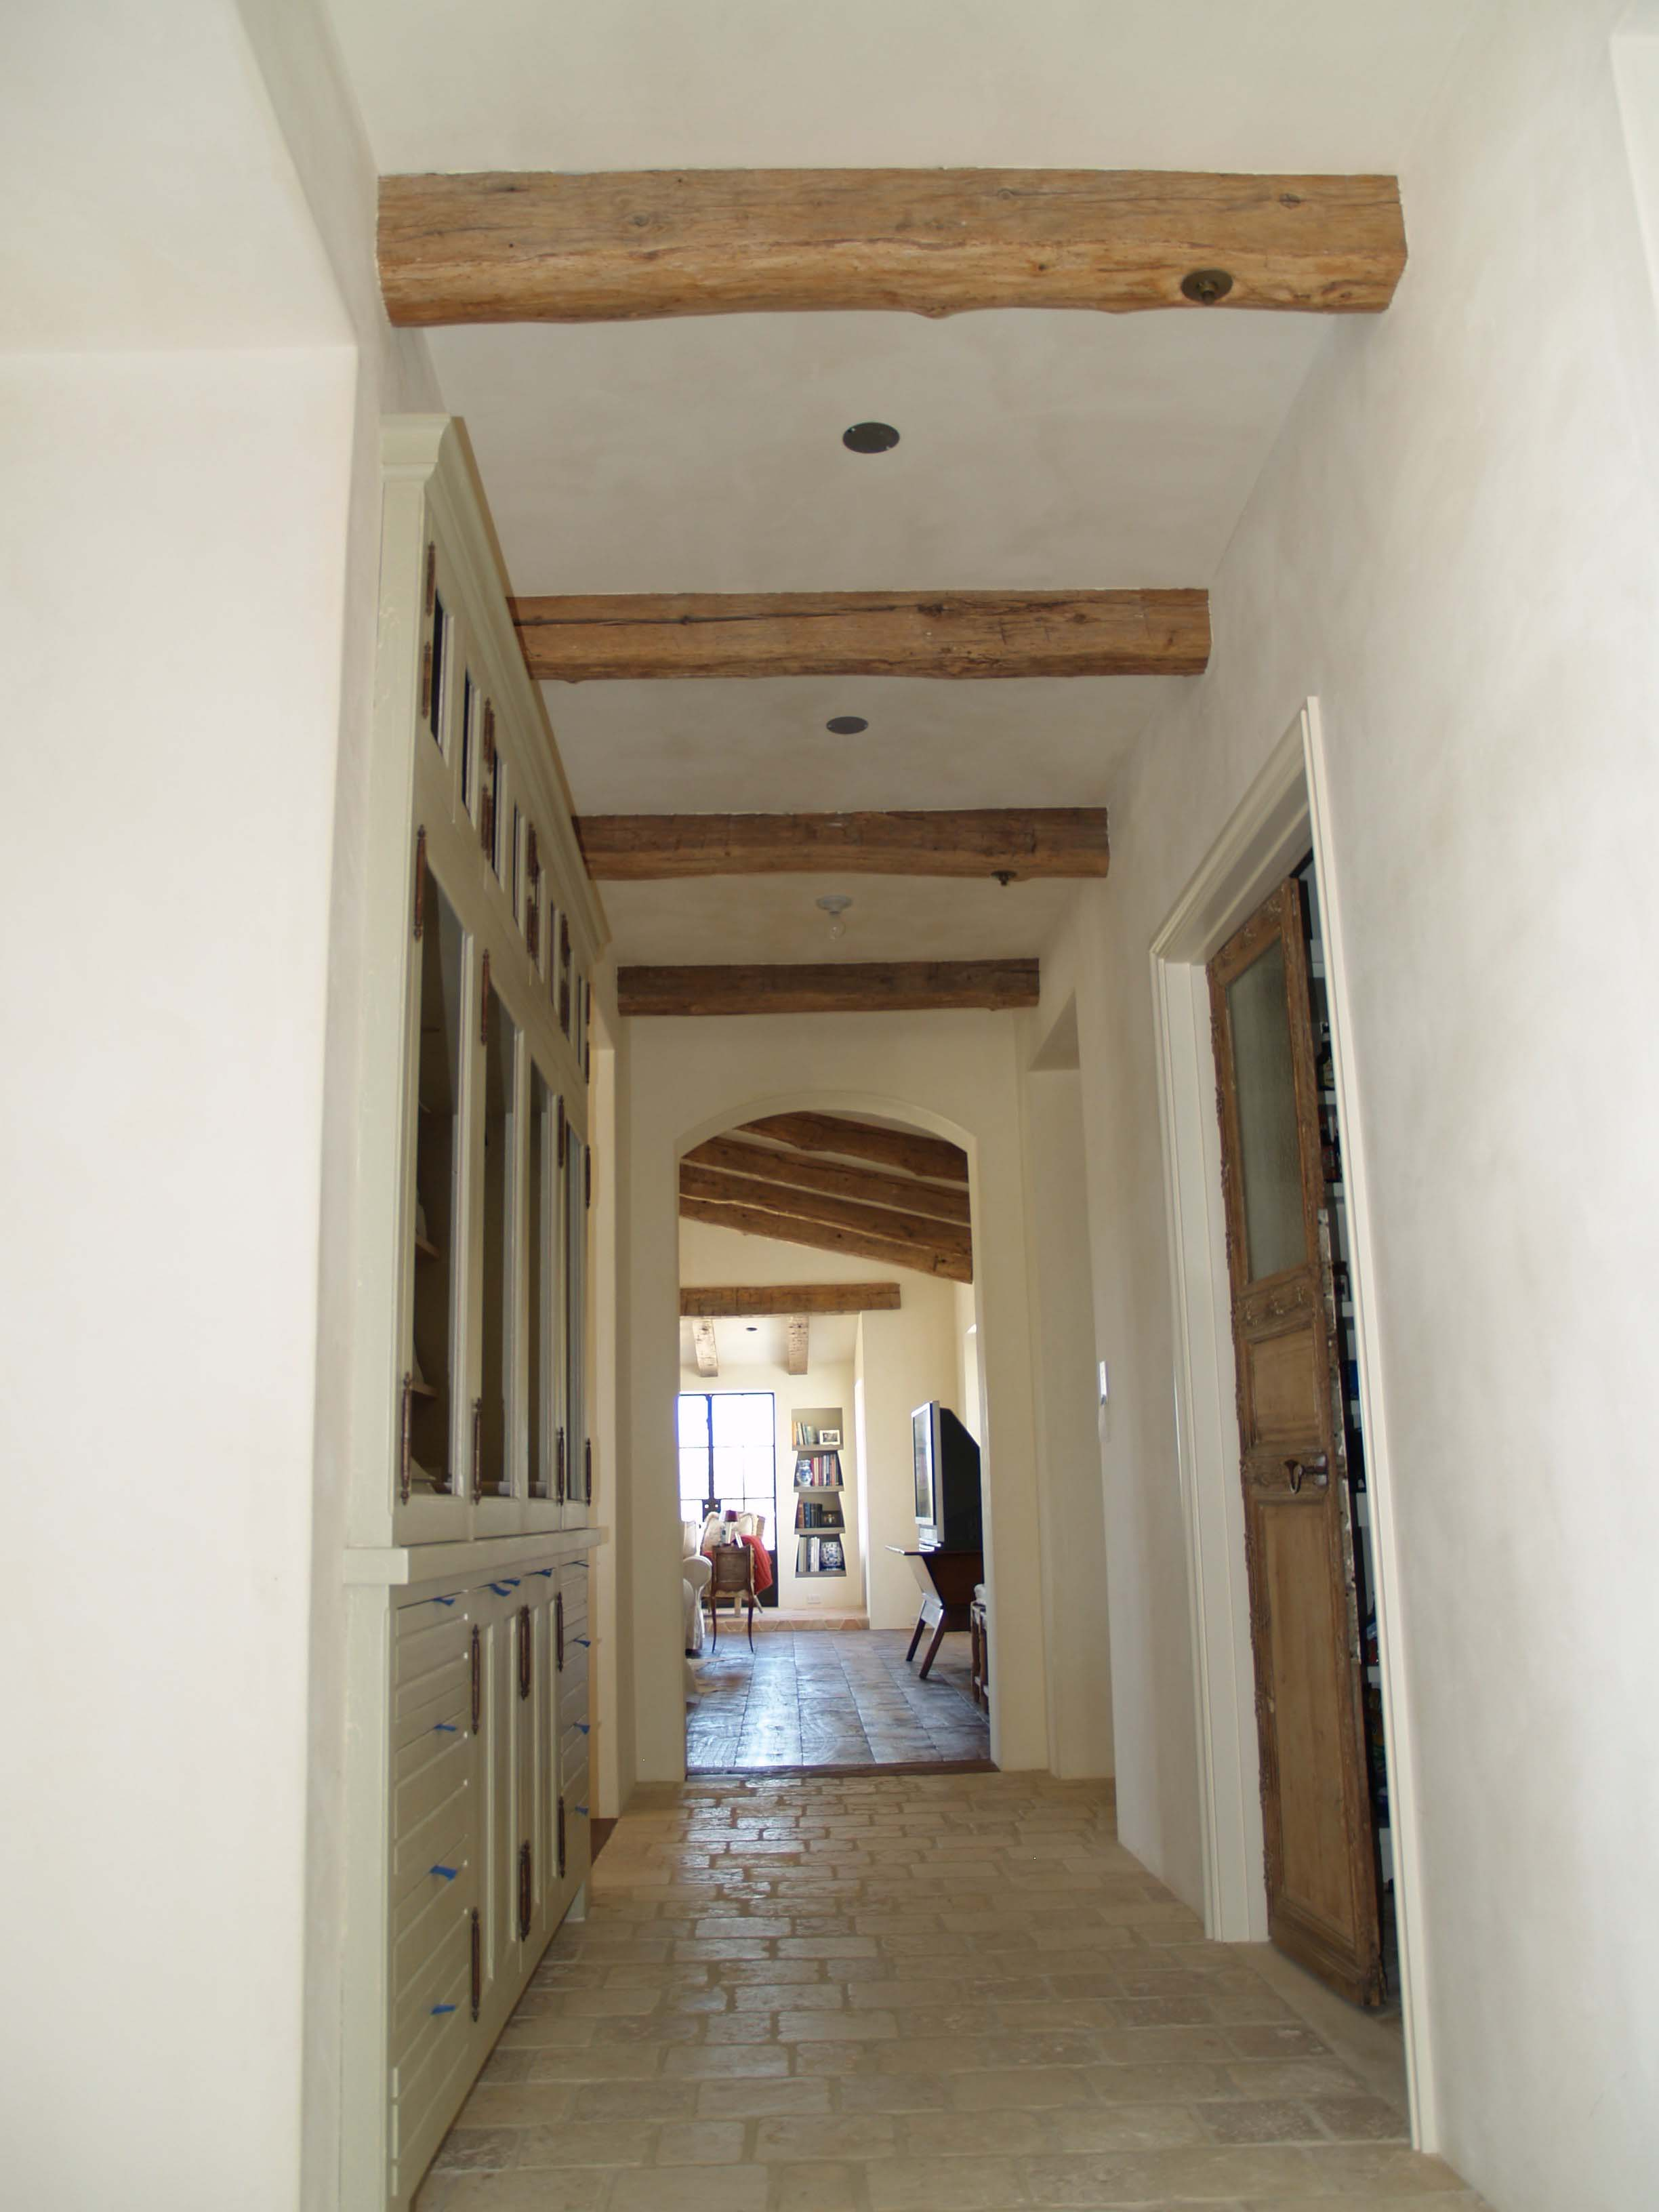 edge hardwood beams14 - Reclaimed Hardwood Barn Timbers